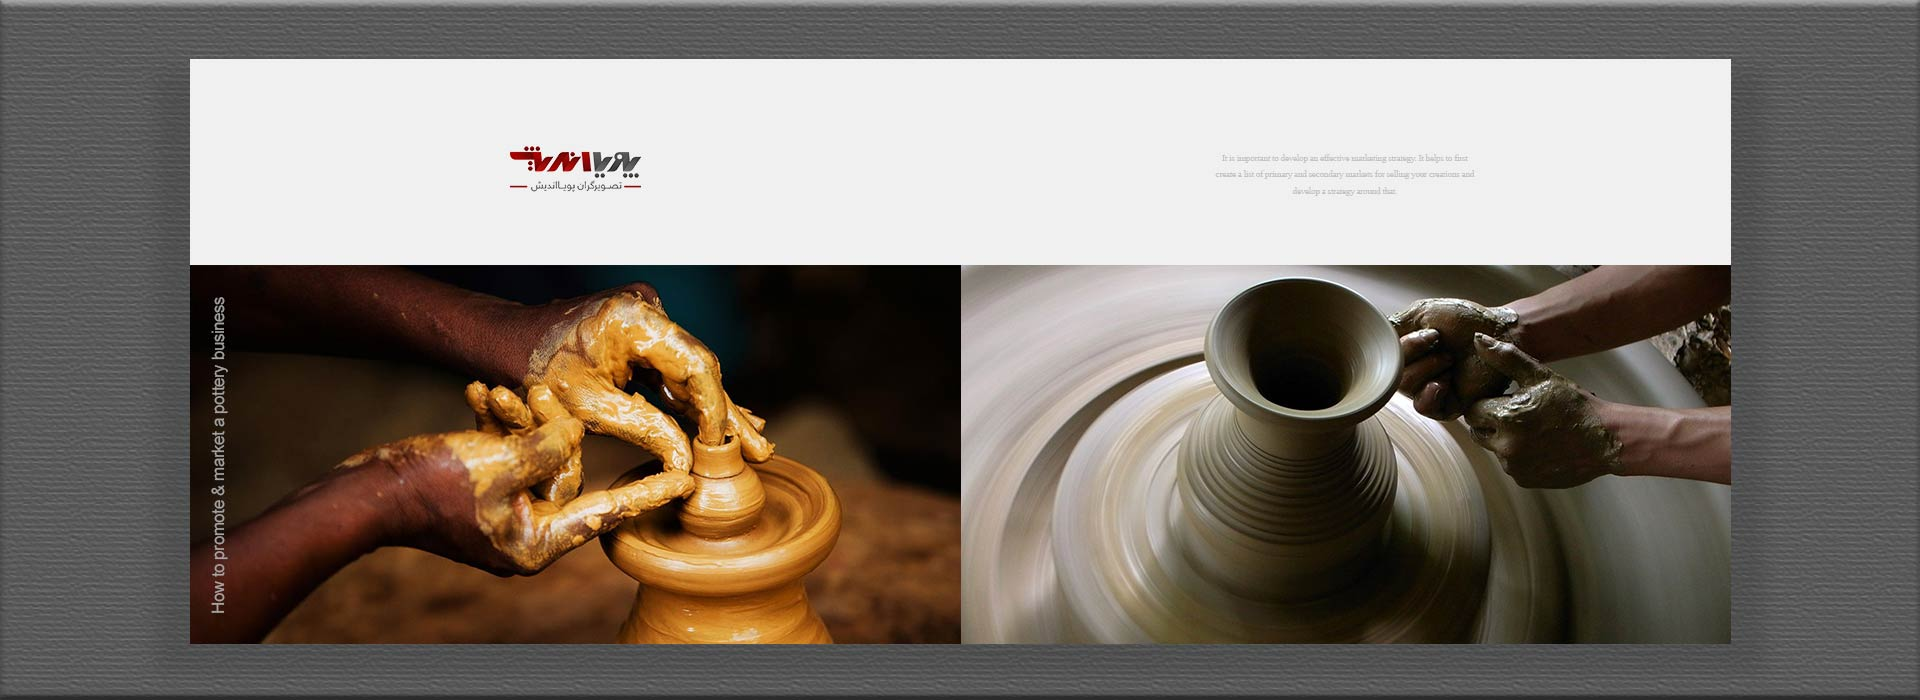 How to promote market  pottery business 1 - چگونه کسب و کار سفالگری راه اندازی کنیم ؟